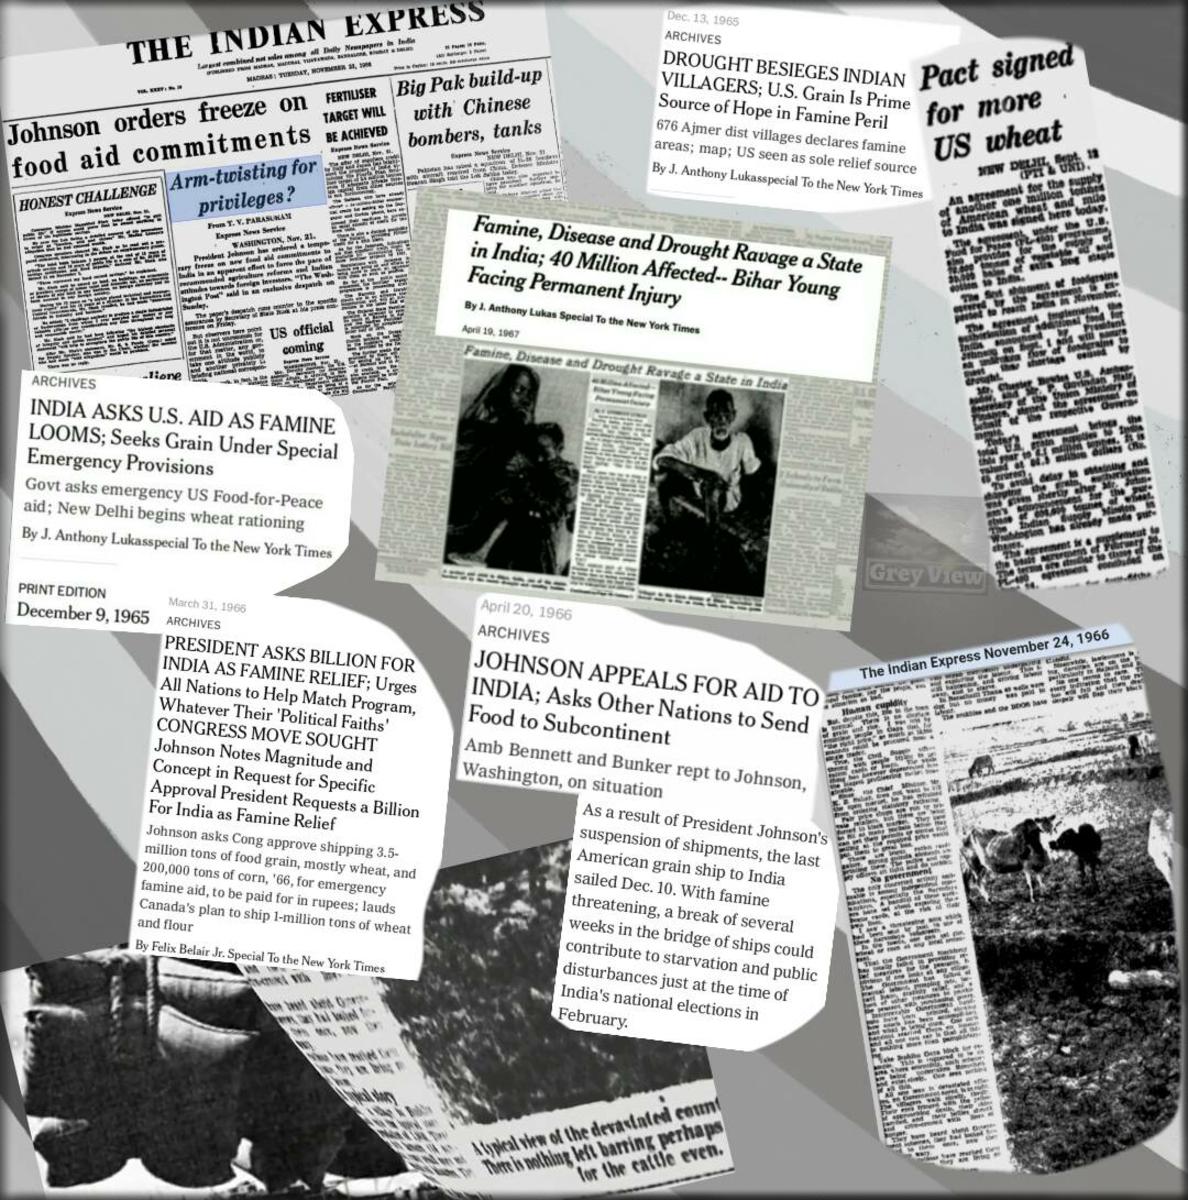 The Bihar Famine (1966-67) - Beyond Politics, Aid and Diplomacy